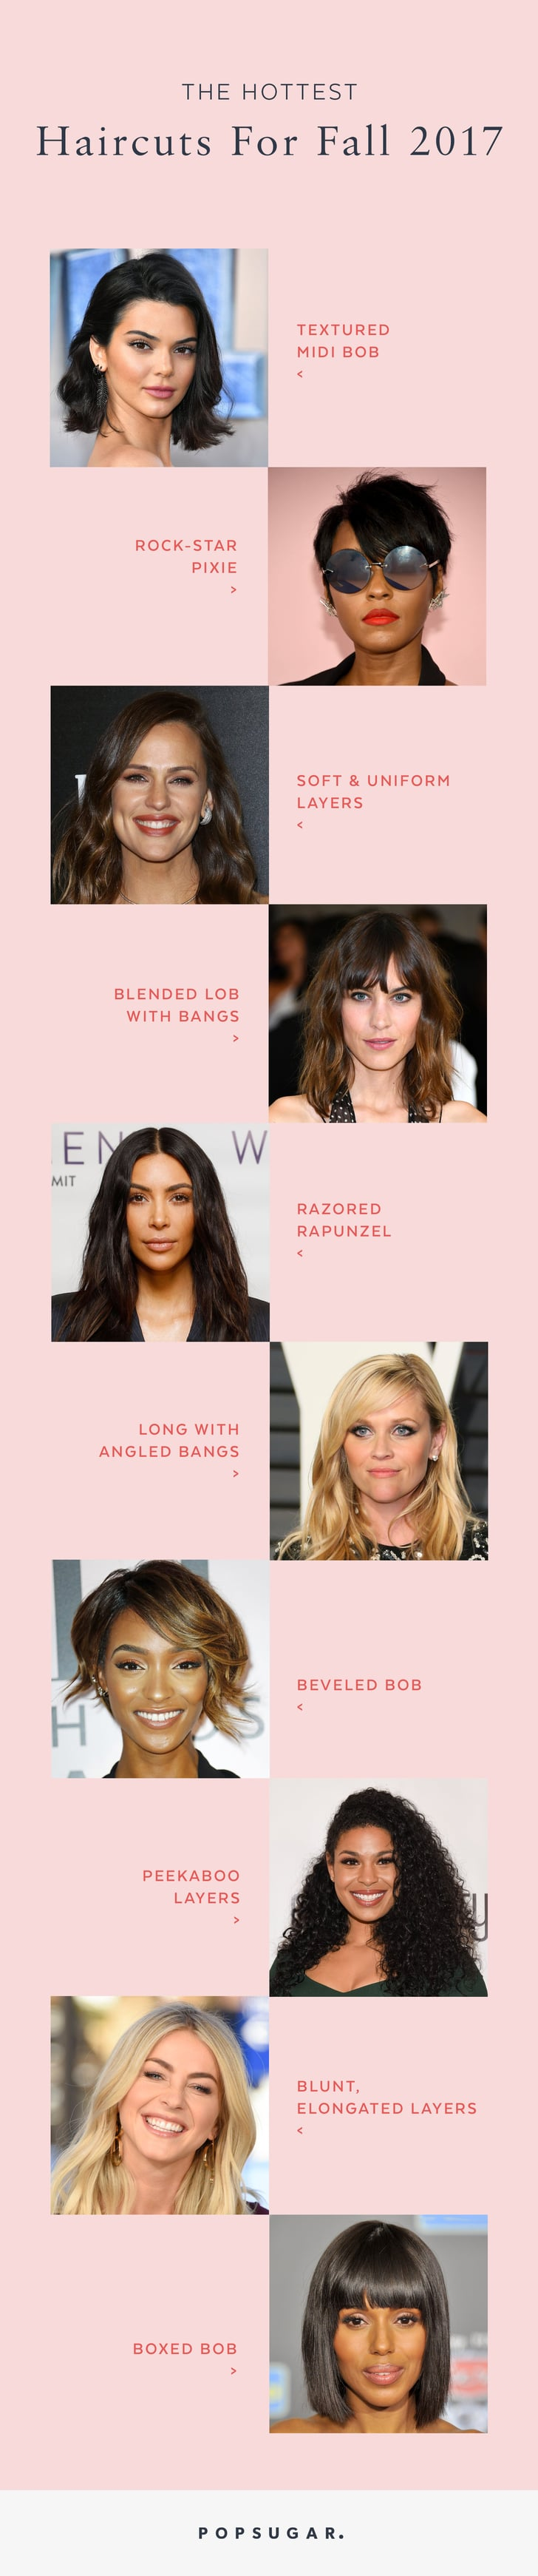 Hottest Haircuts Fall 2017